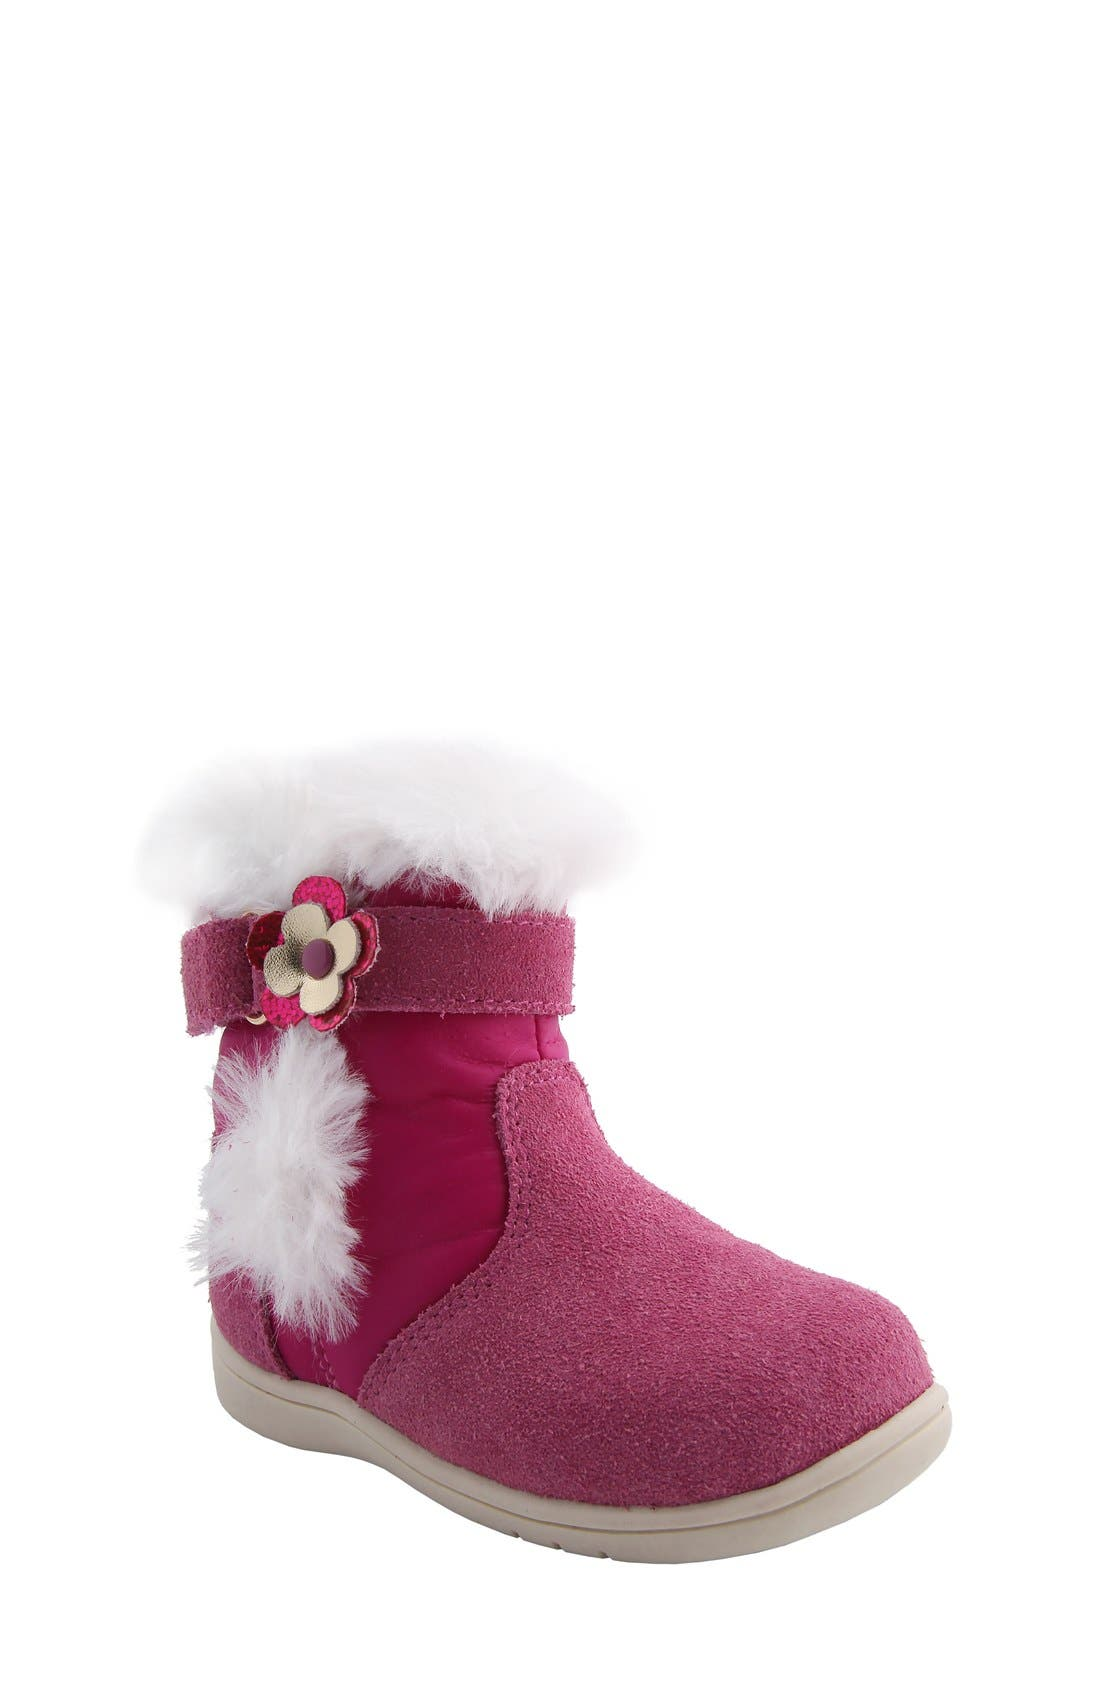 Nina 'Anya' Faux Fur Bootie,                         Main,                         color, Pink Suede